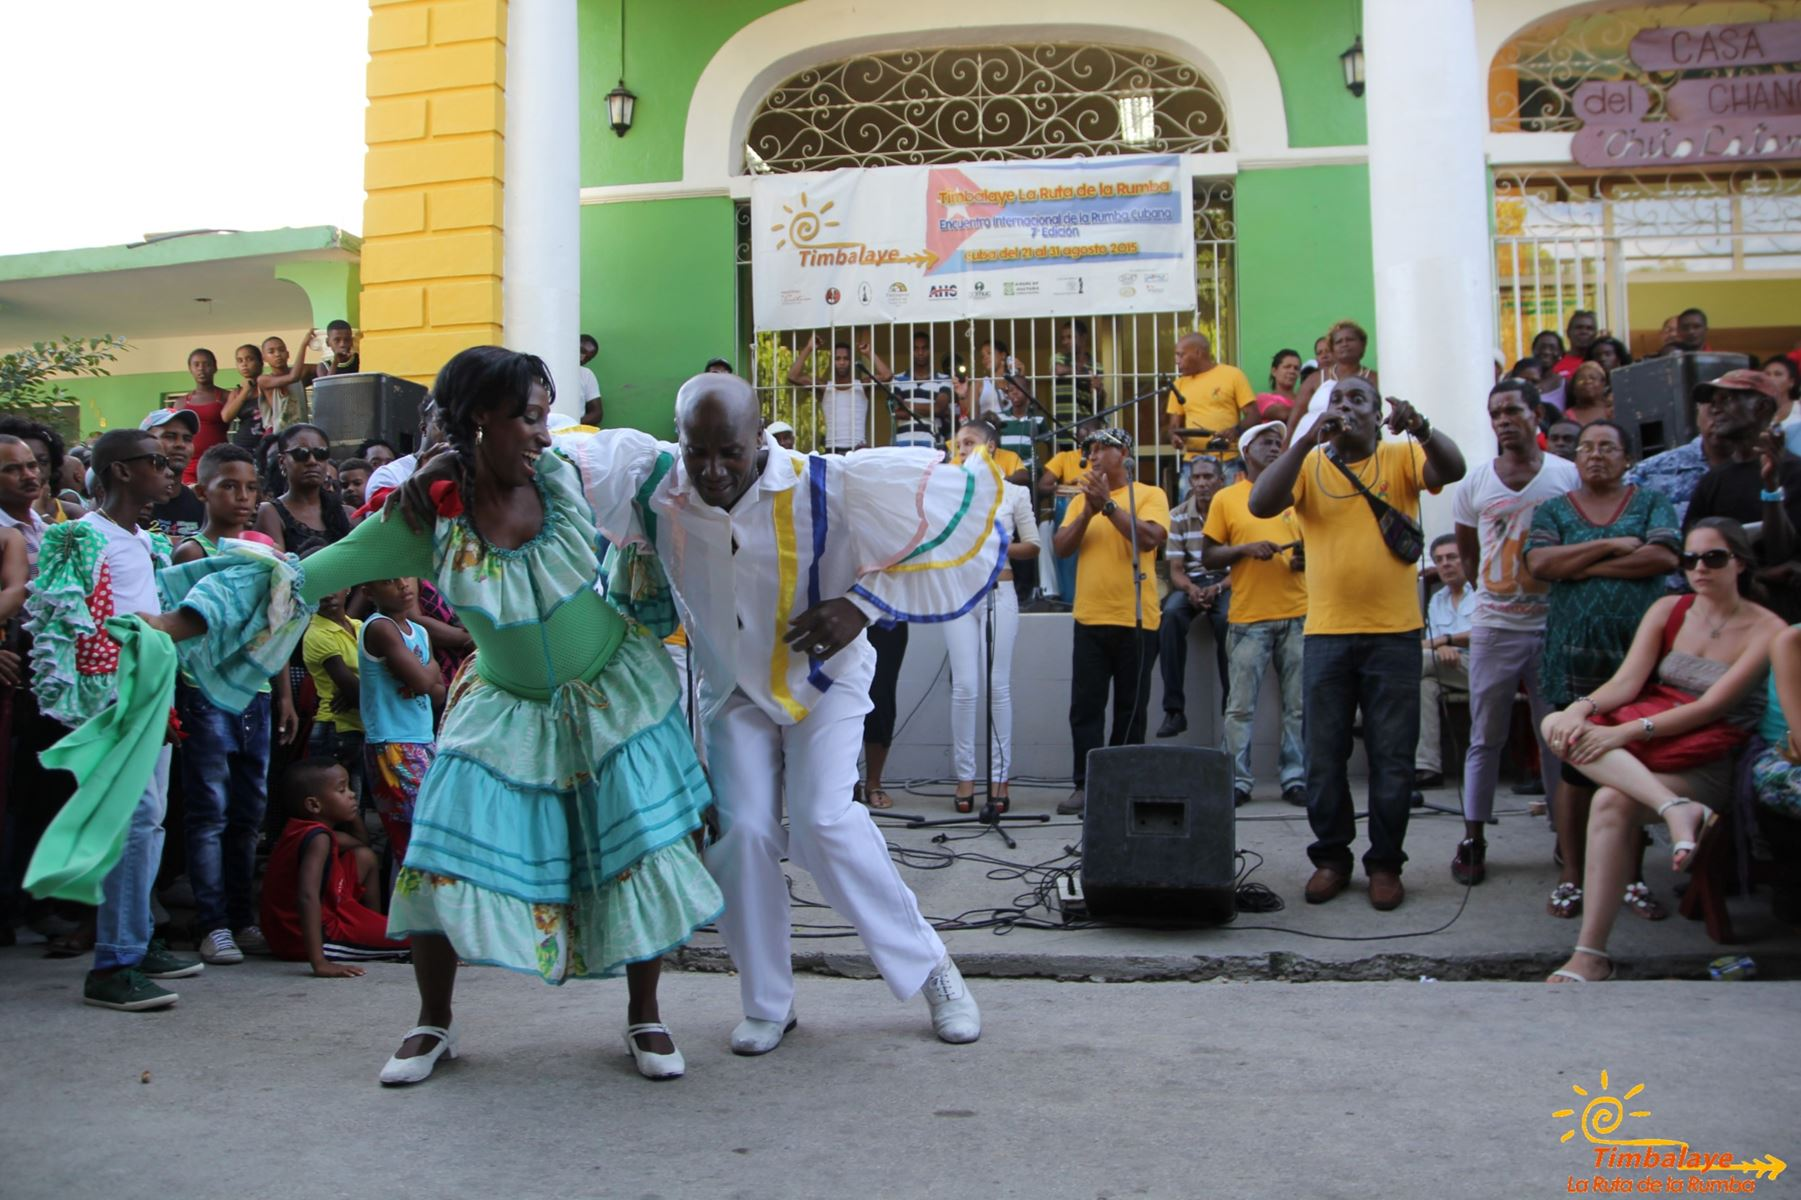 Festival de Rumba 3B